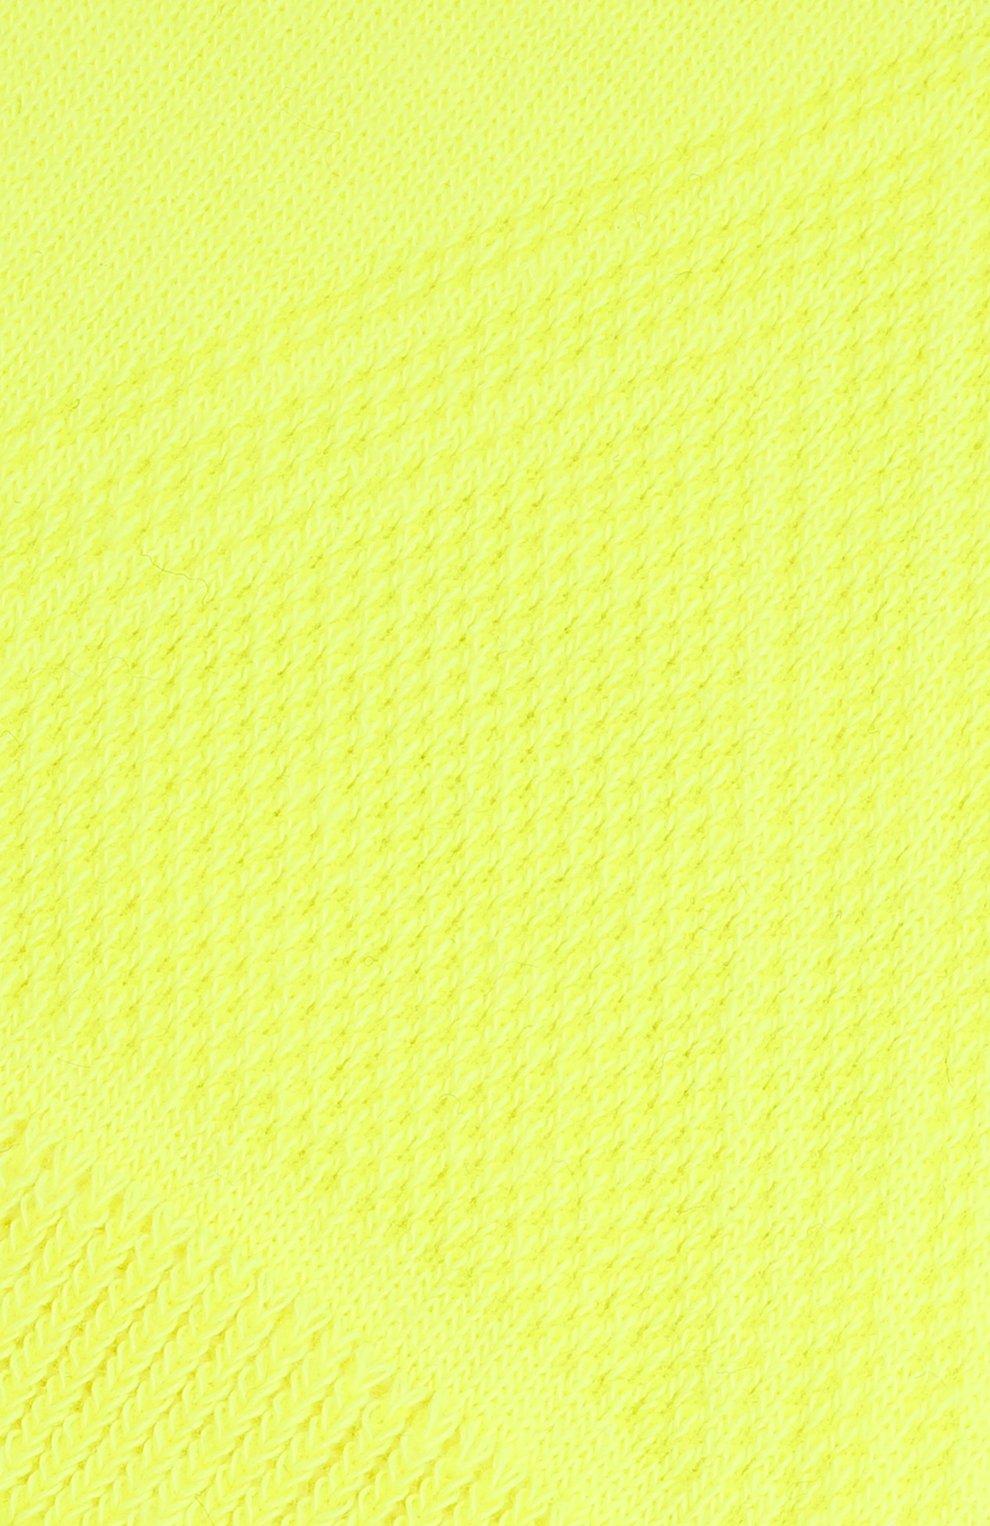 Мужские подследники cool kick FALKE желтого цвета, арт. 16601 | Фото 2 (Кросс-КТ: бельё; Материал внешний: Синтетический материал)